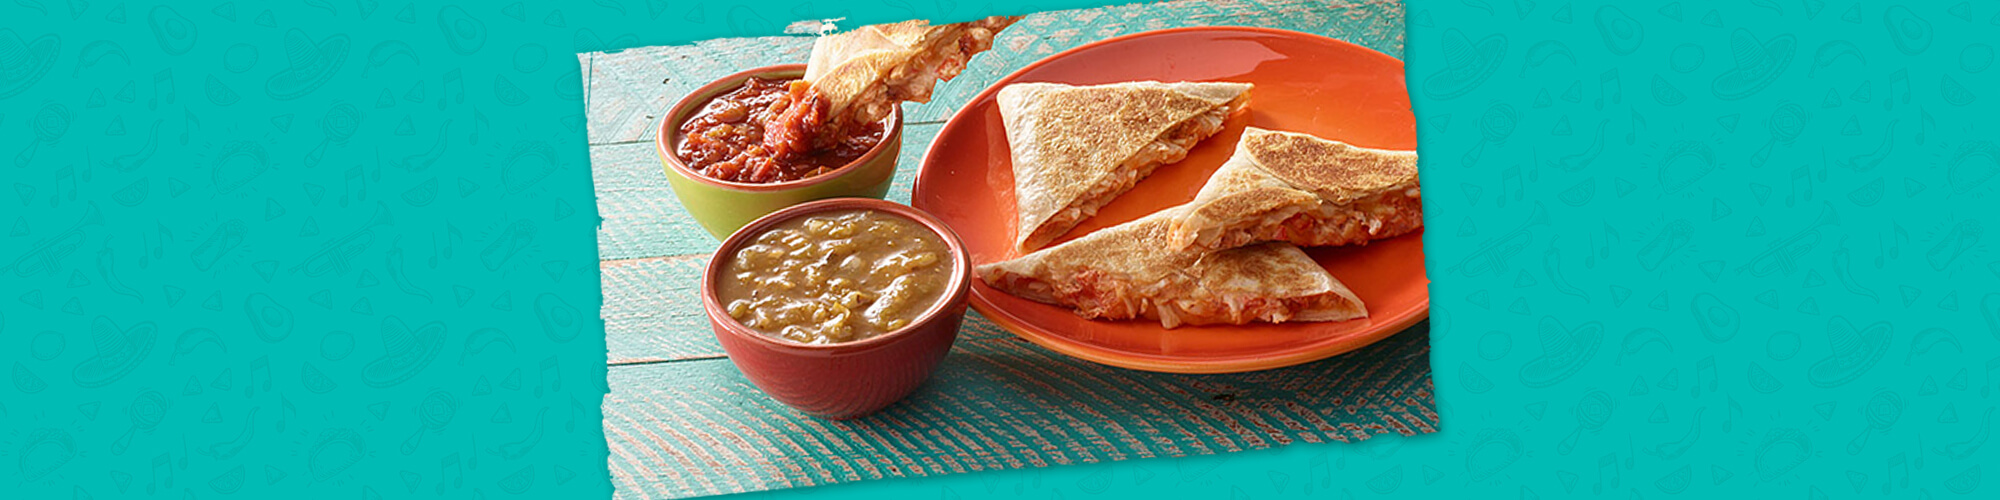 Salsas foldable chipotle chicken quesadilla